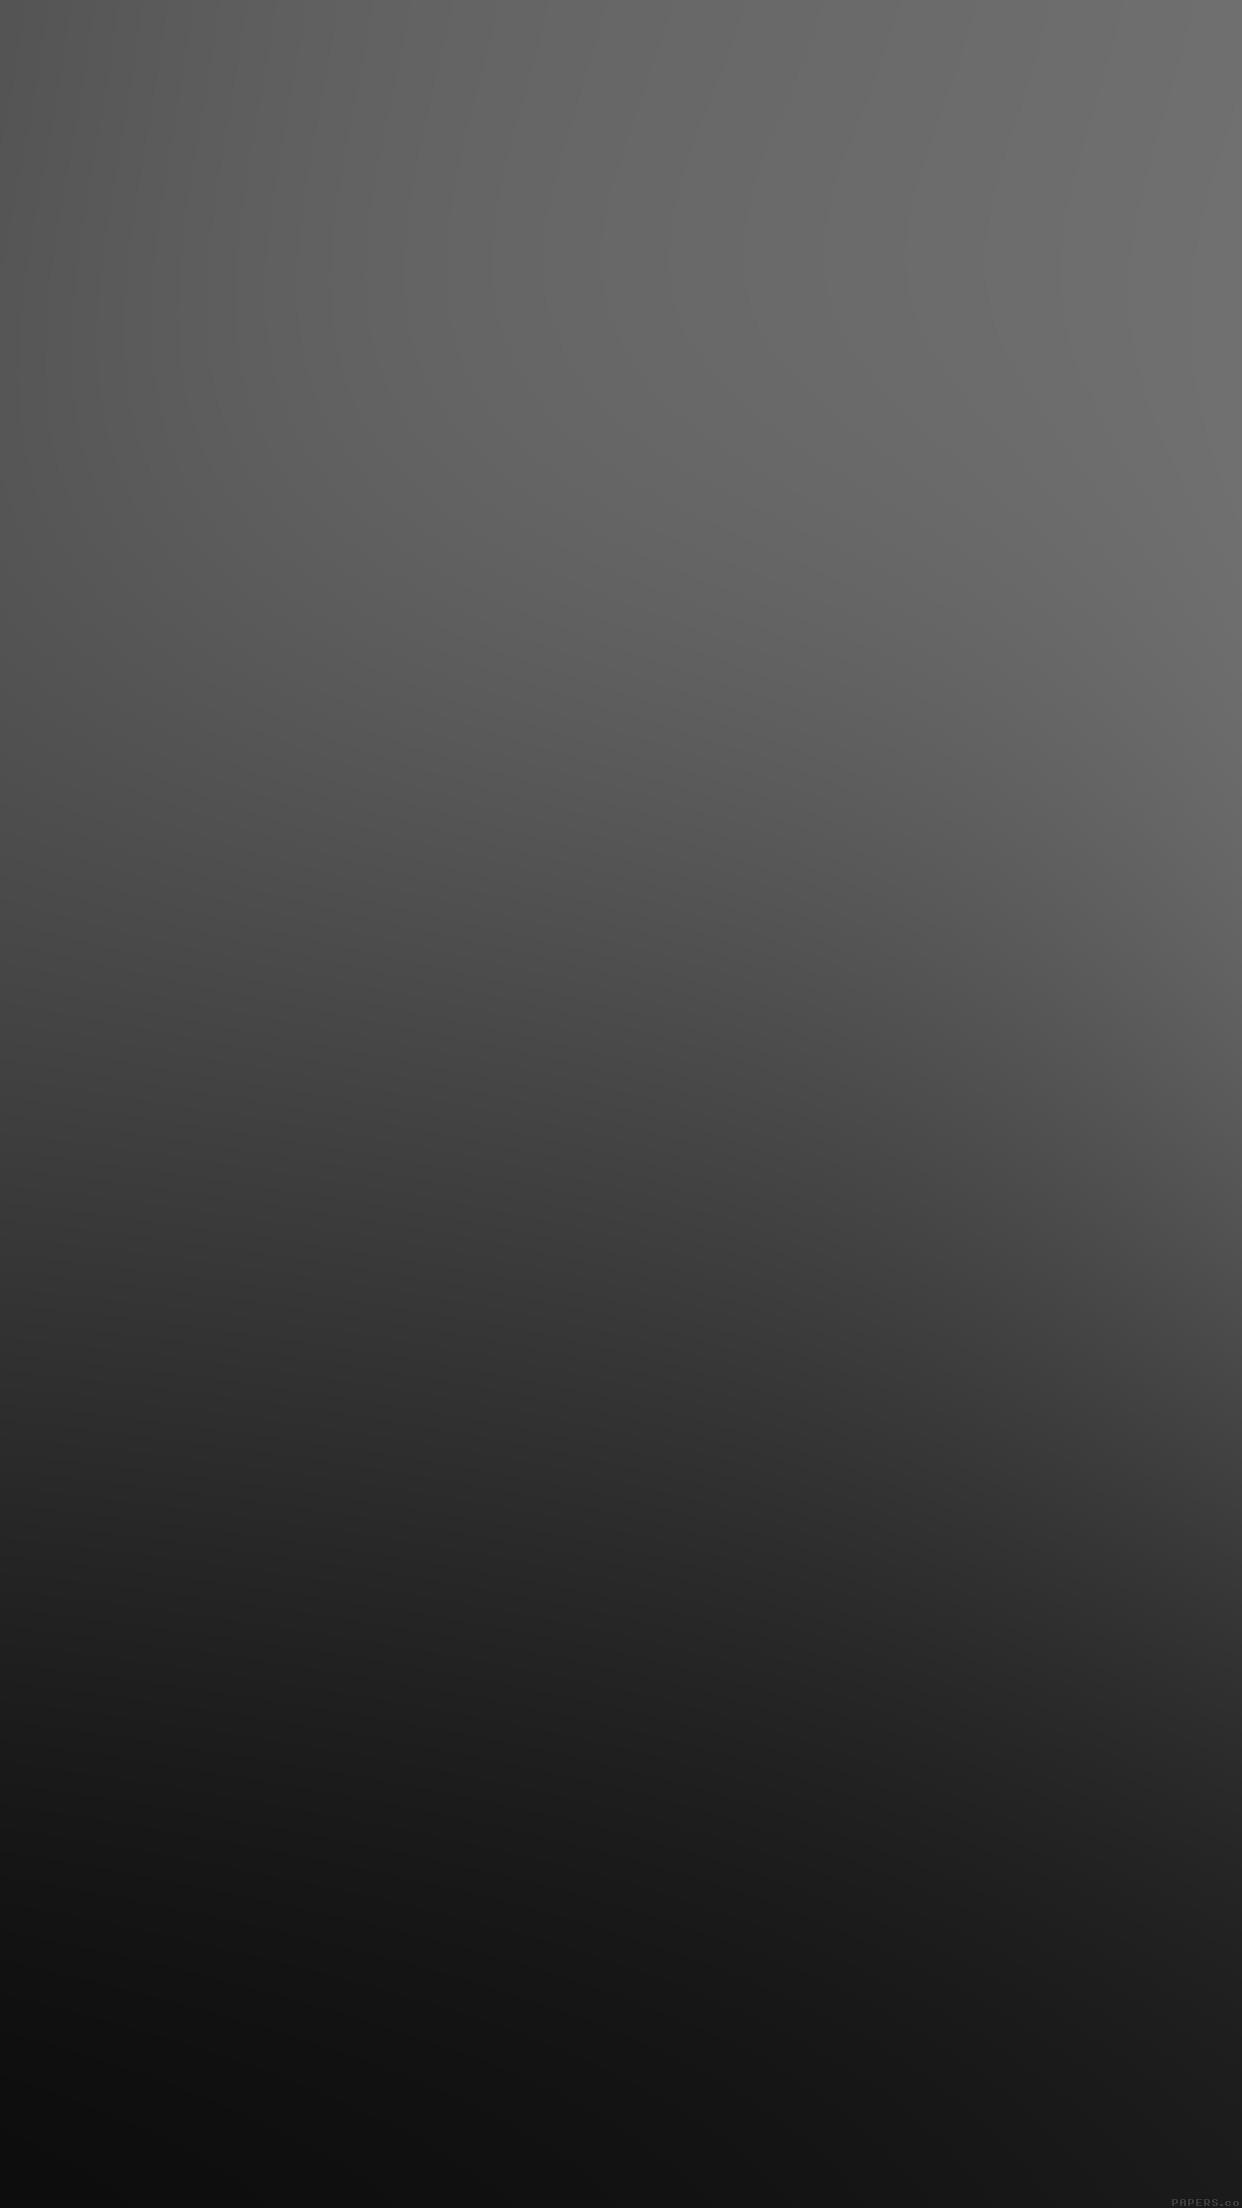 March Apple Event Dark Black Pattern 34 Iphone   Data - Iphone Black Gradient Background - HD Wallpaper